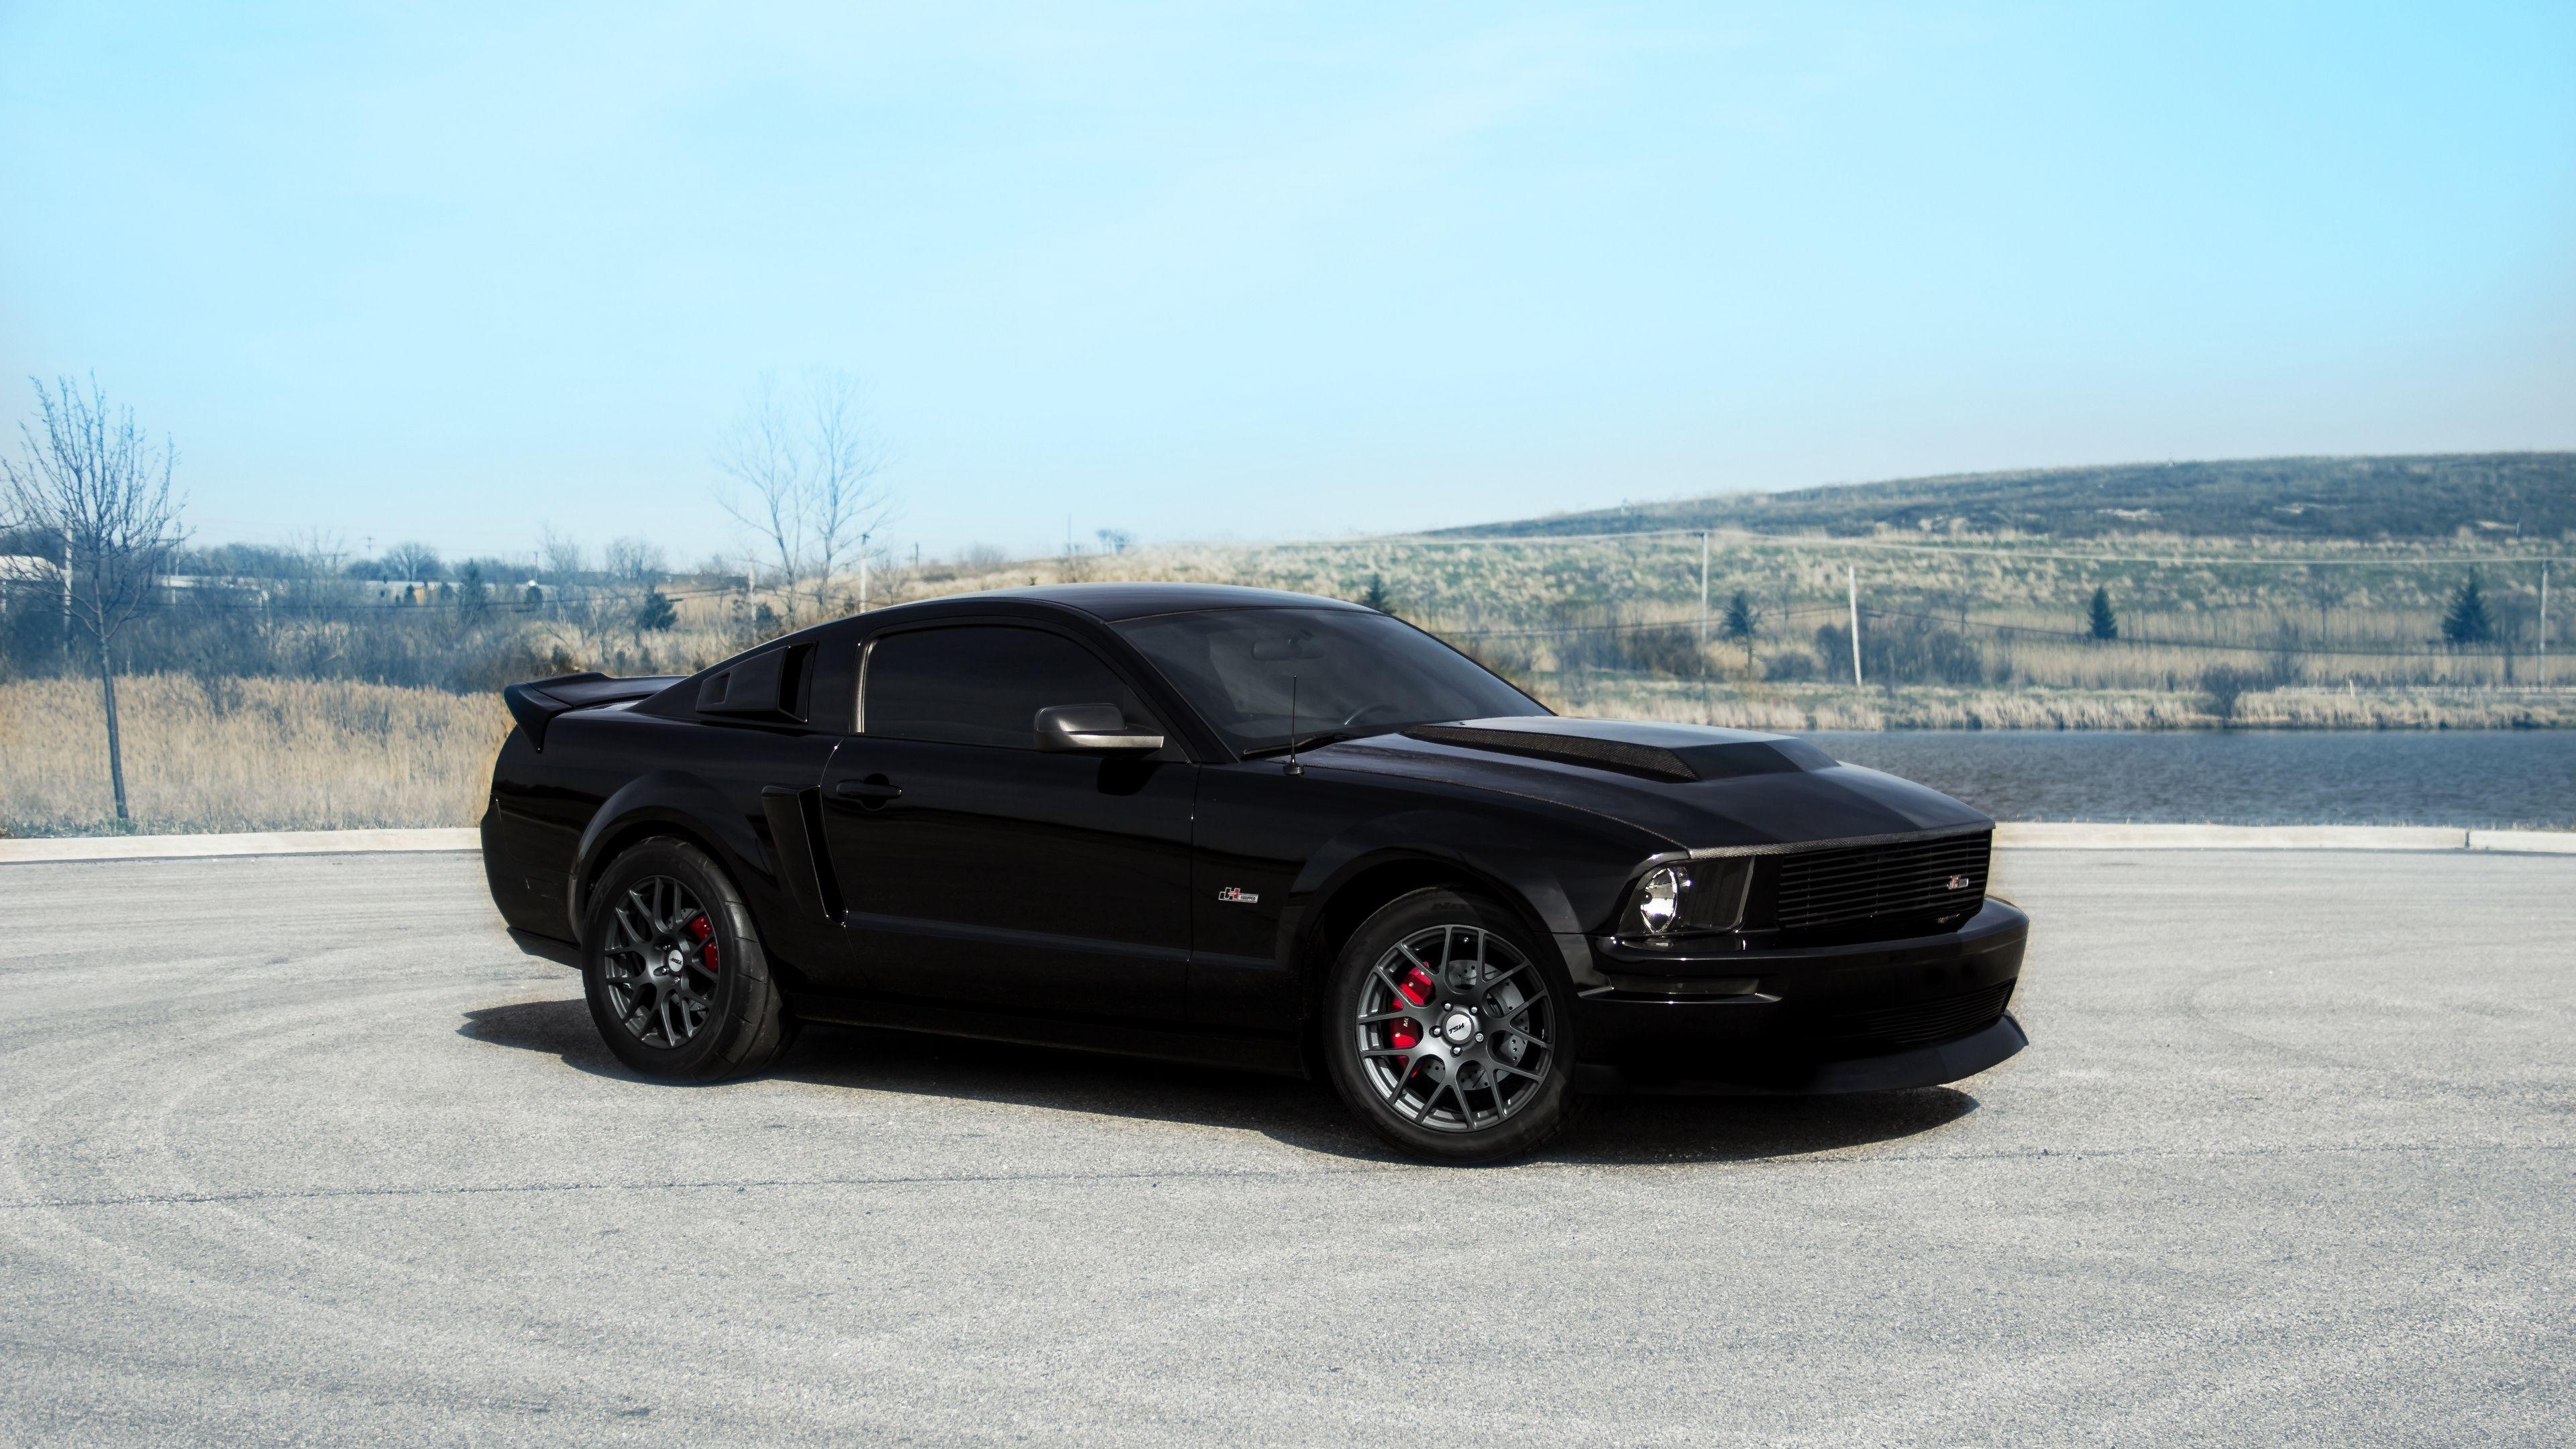 Ford Mustang Gt Black Landscape Red 4k Mustang Gt Ford Mustang Ford Mustang Gt Wallpaper Mustang Gt